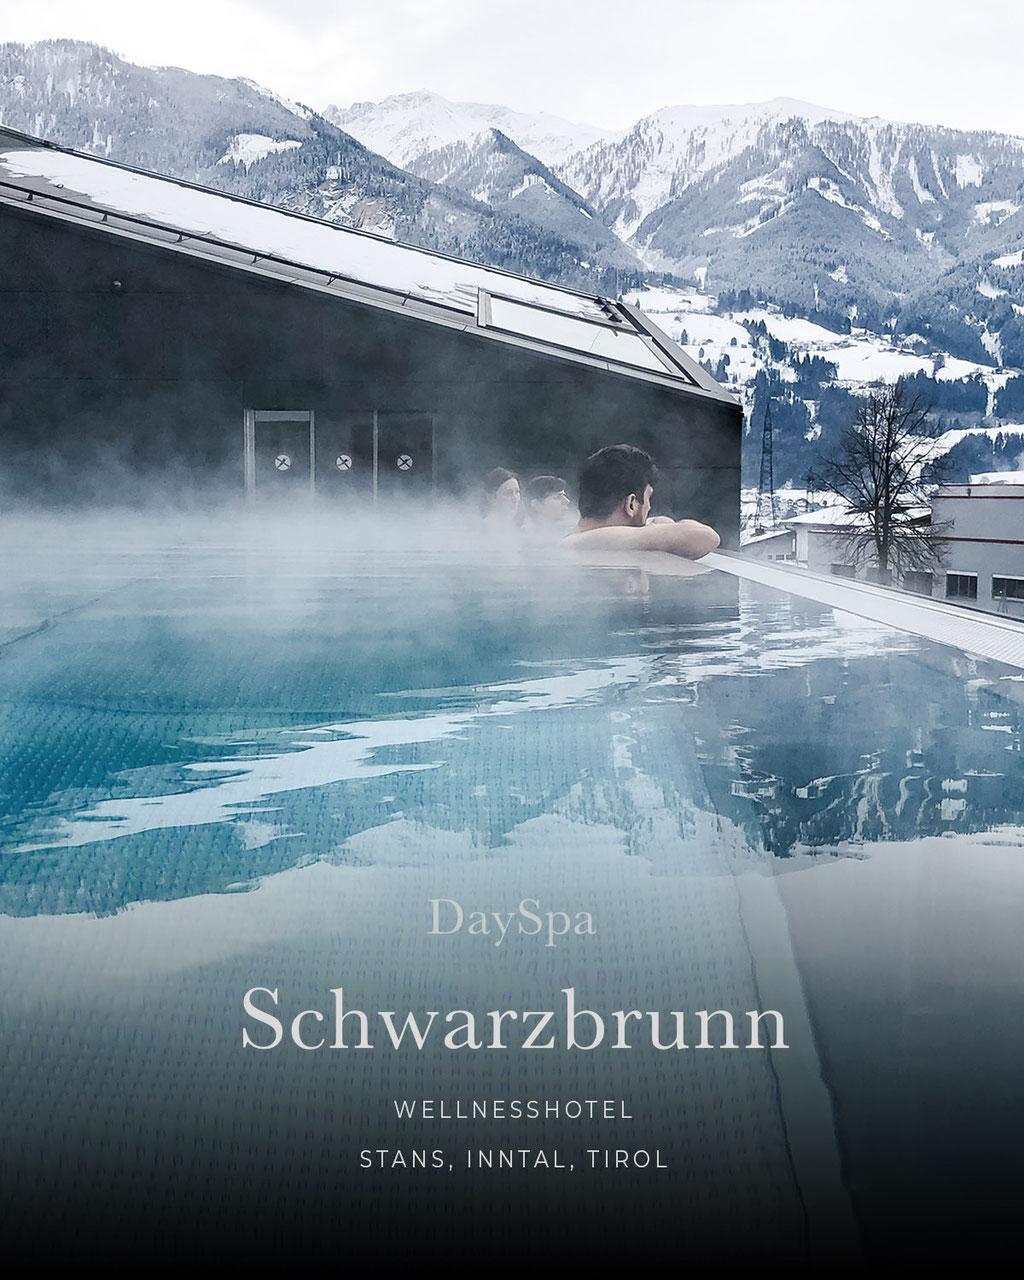 DAY SPA Schwarzbrunn, Tirol